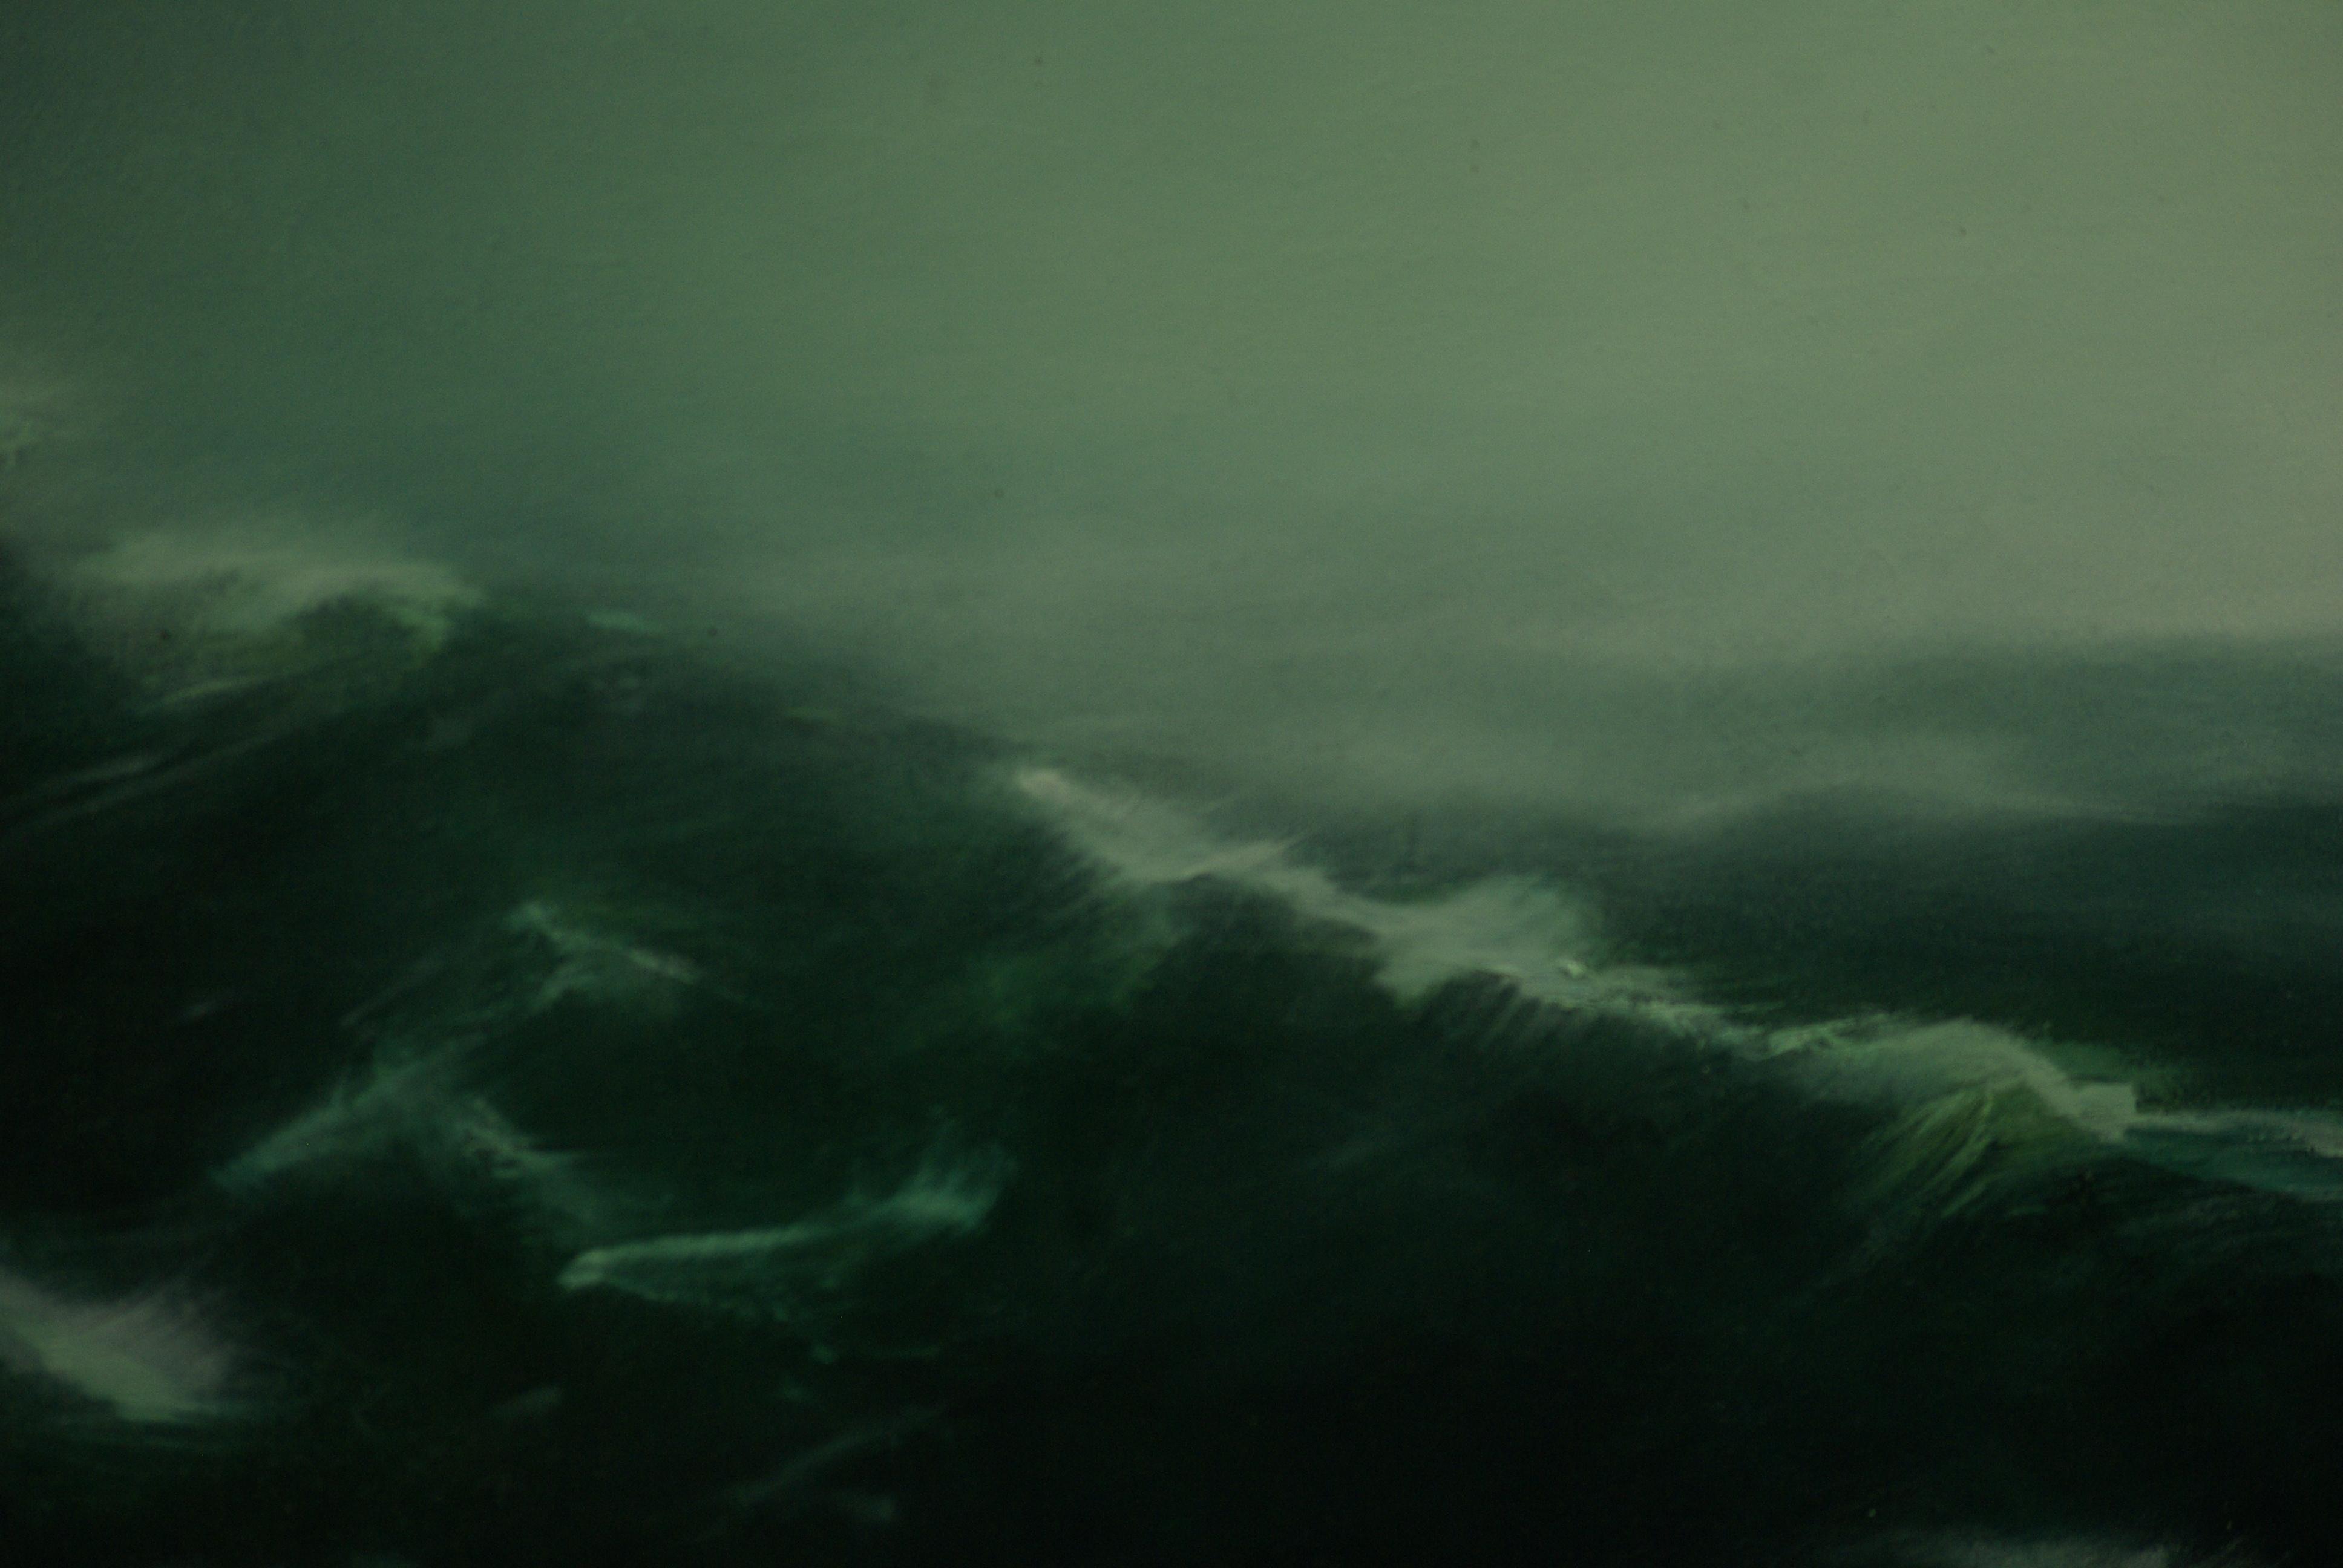 Southern Ocean 2014 (detail)